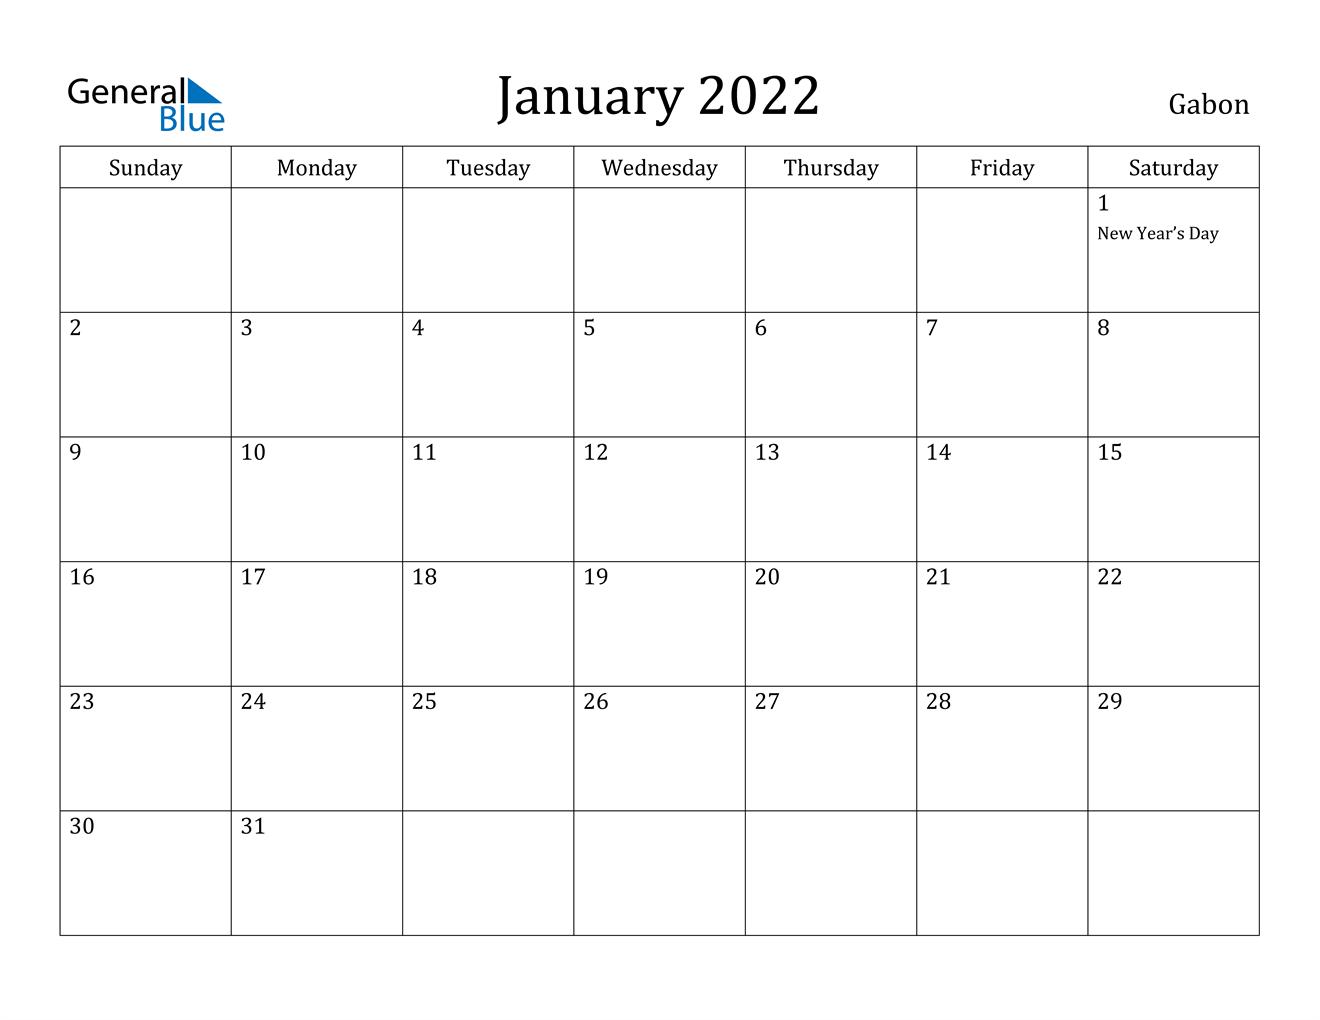 January 2022 Calendar - Gabon Regarding January 2022 Calendar Template